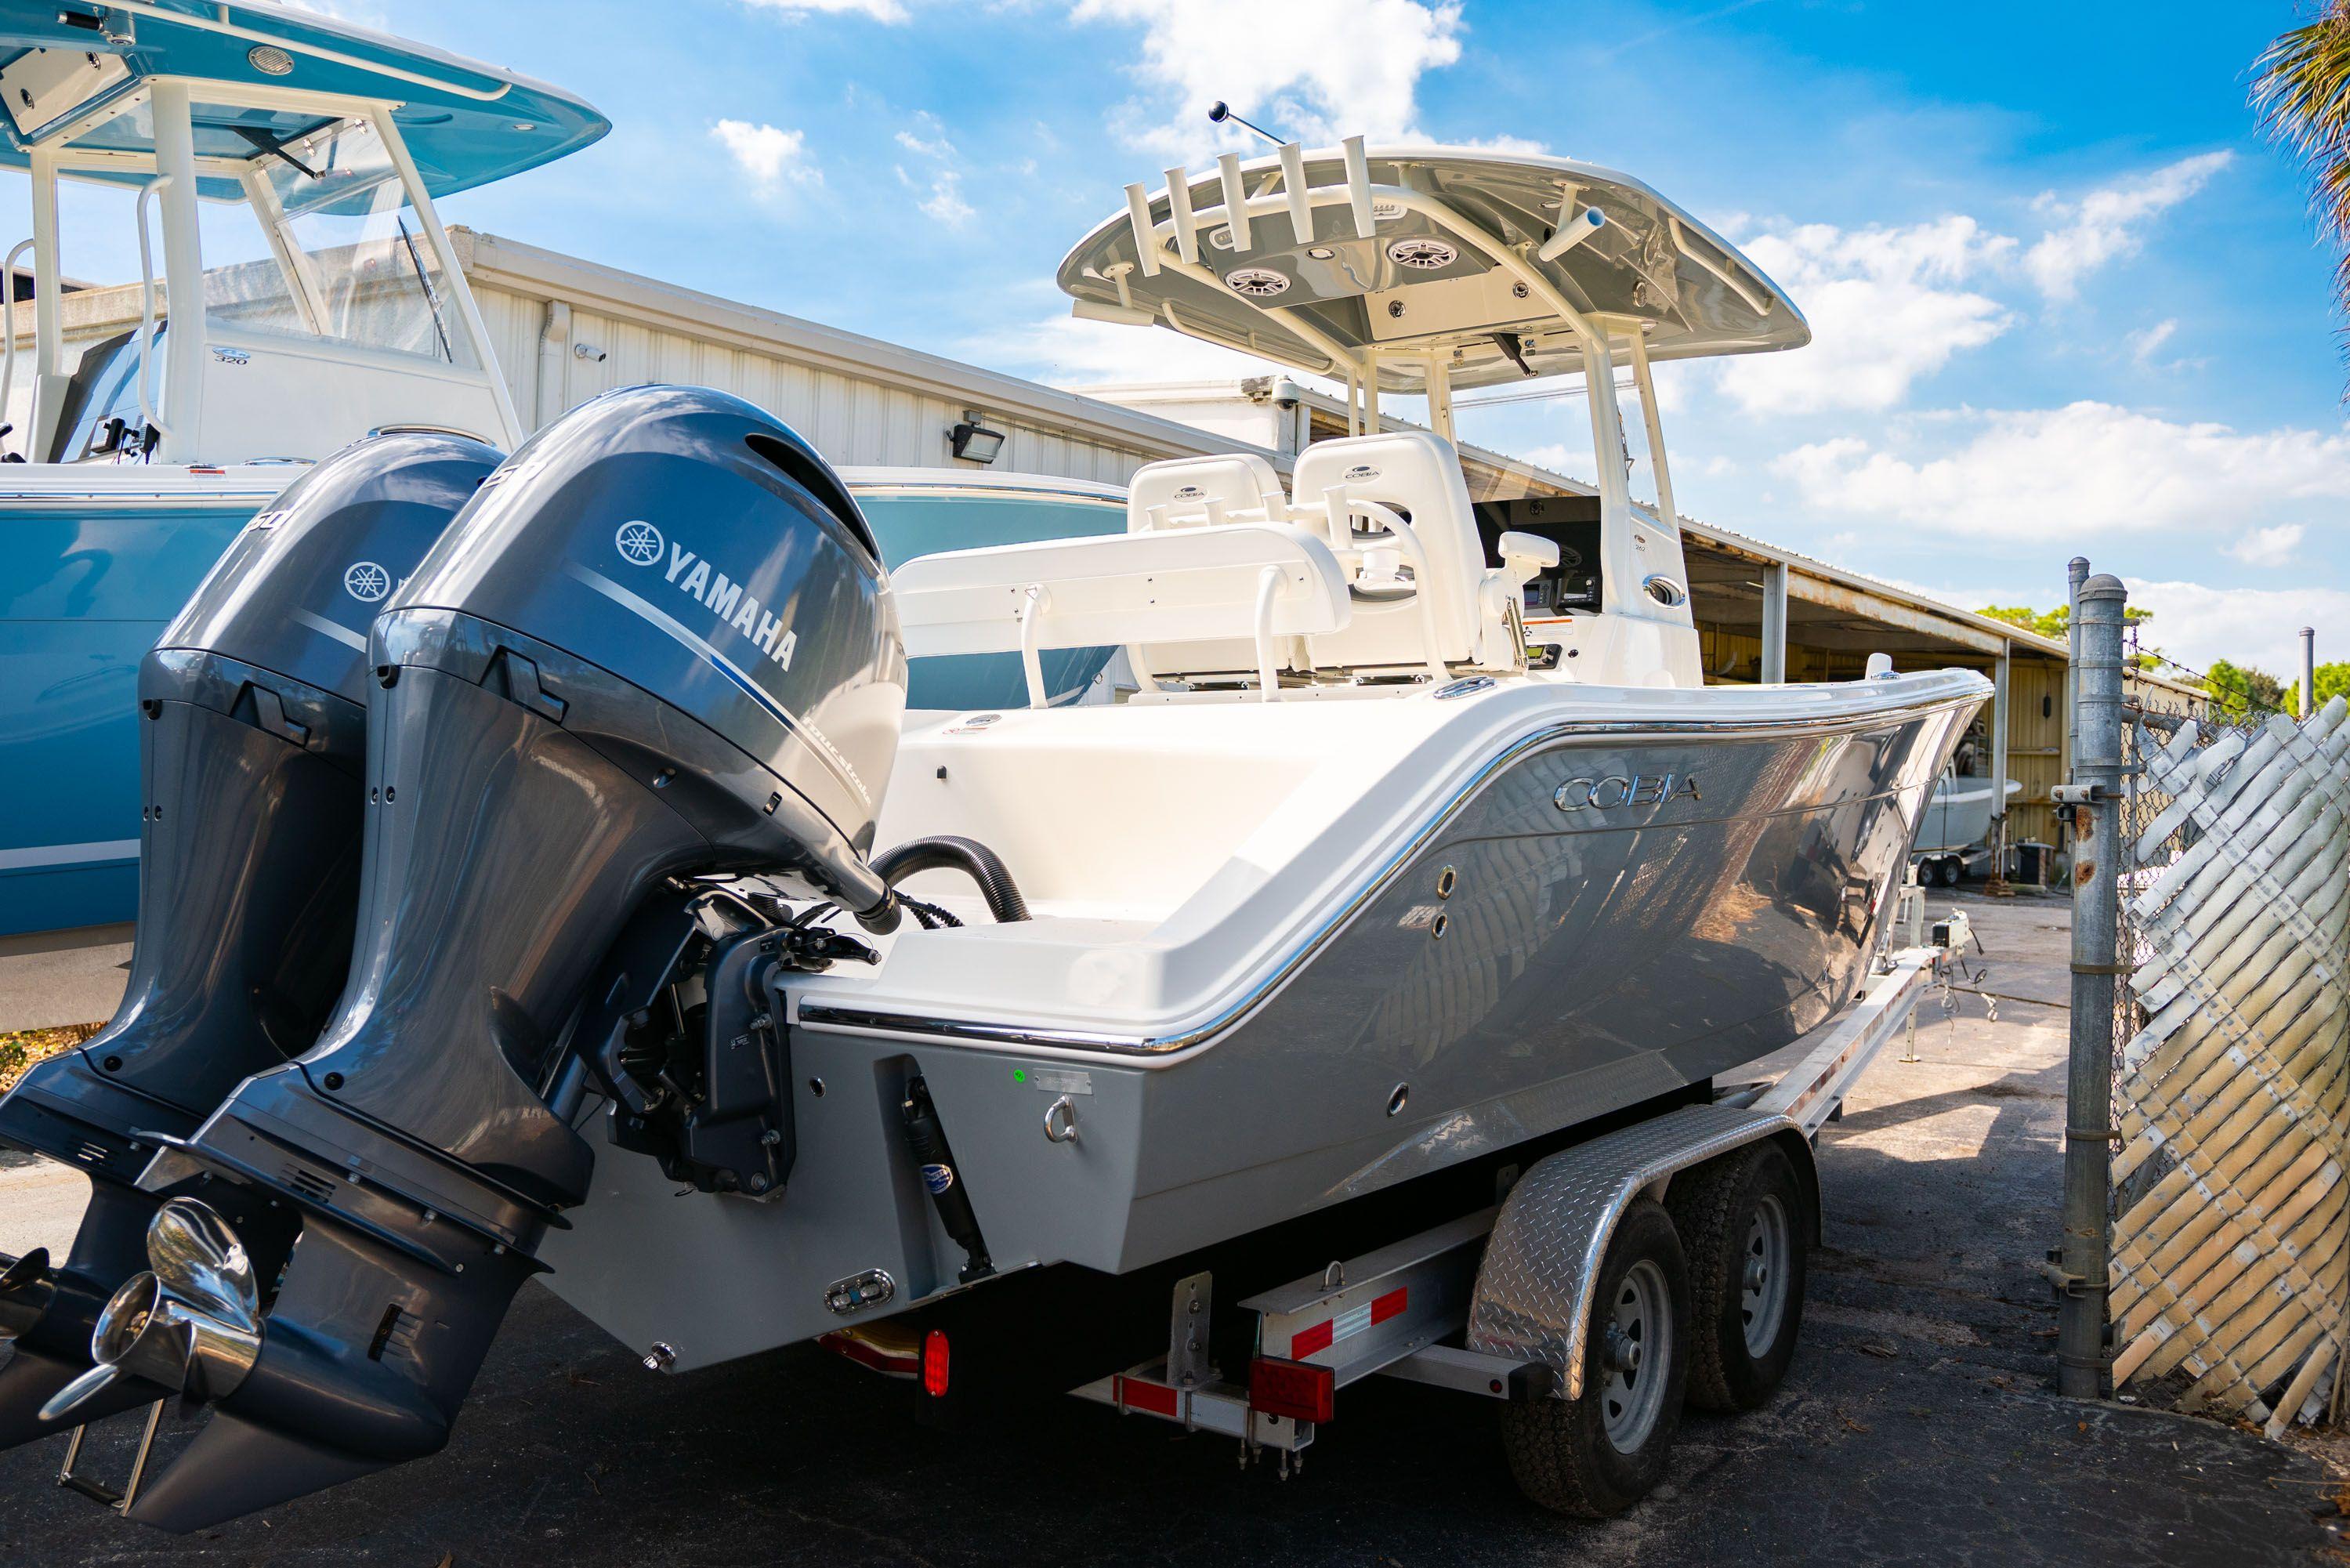 Thumbnail 3 for New 2020 Cobia 262 CC Center Console boat for sale in Vero Beach, FL